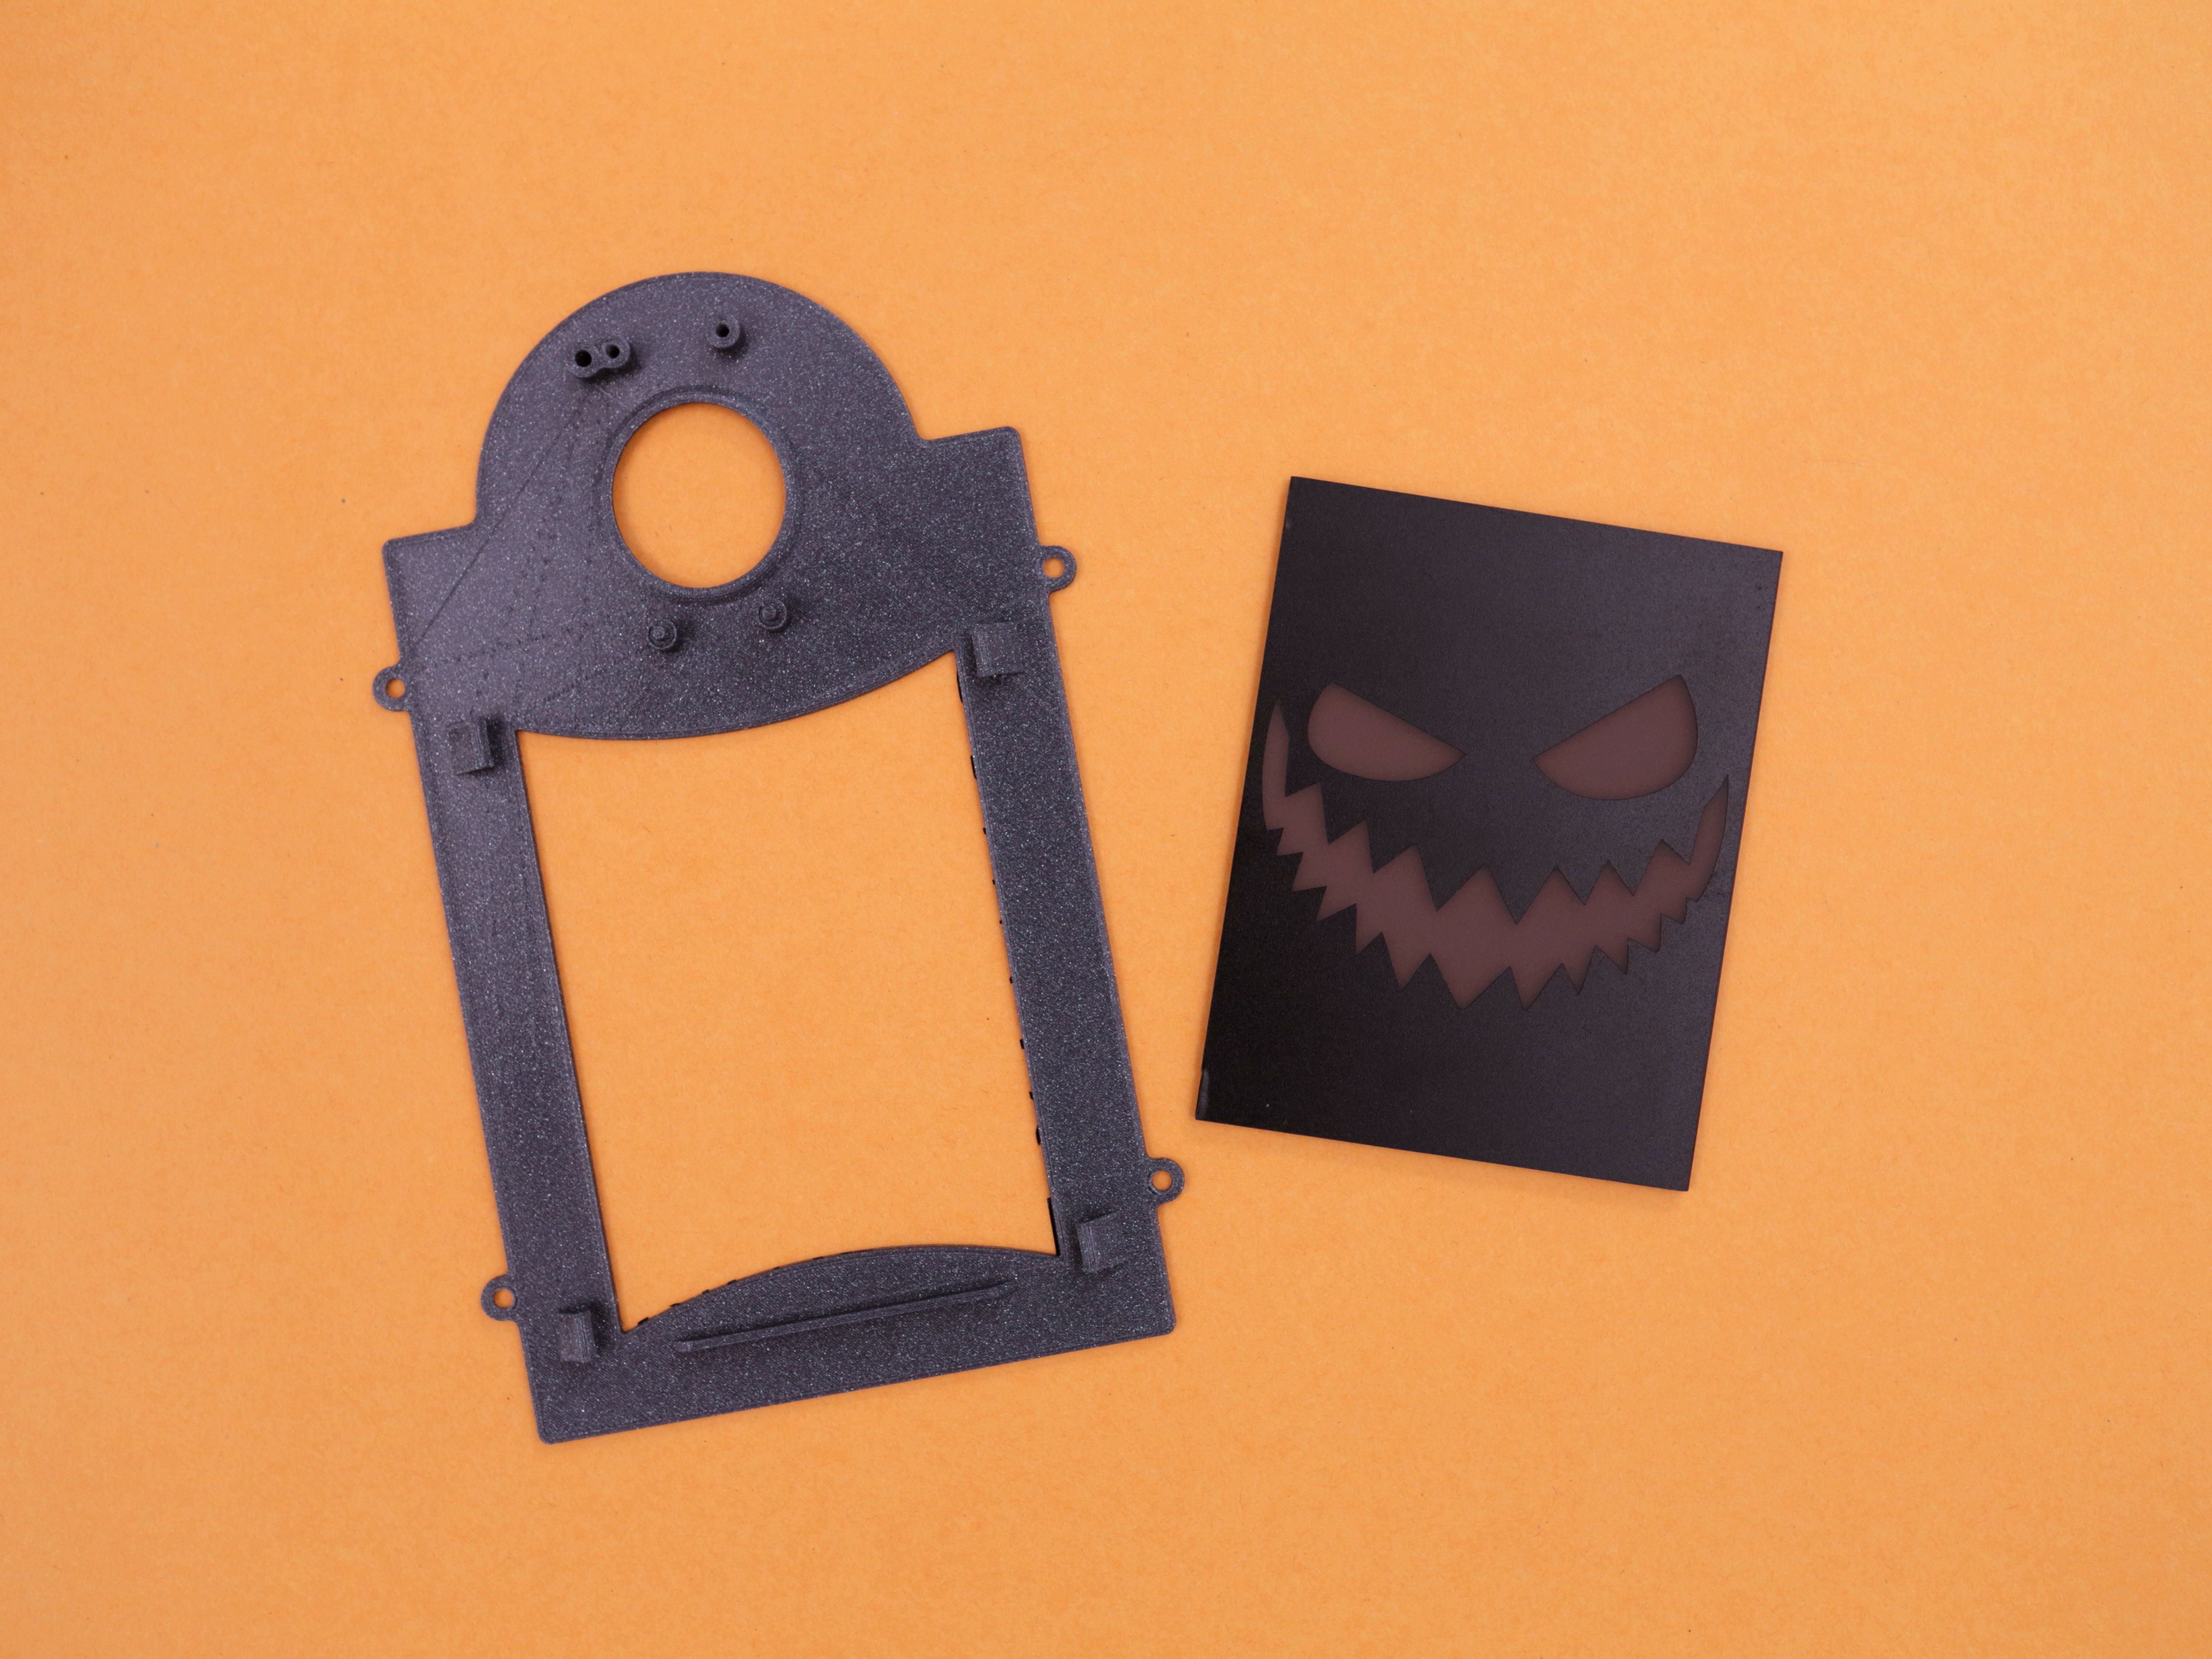 led_strips_plate-acrylic.jpg